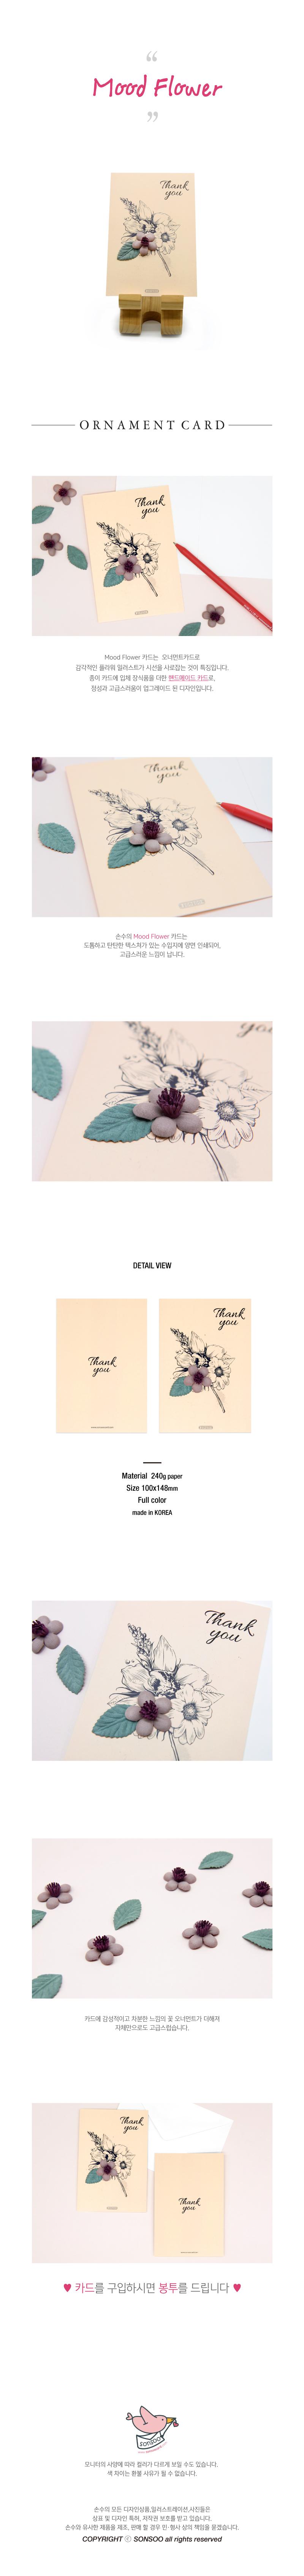 Mood flower - 손수카드, 3,800원, 카드, 감사 카드